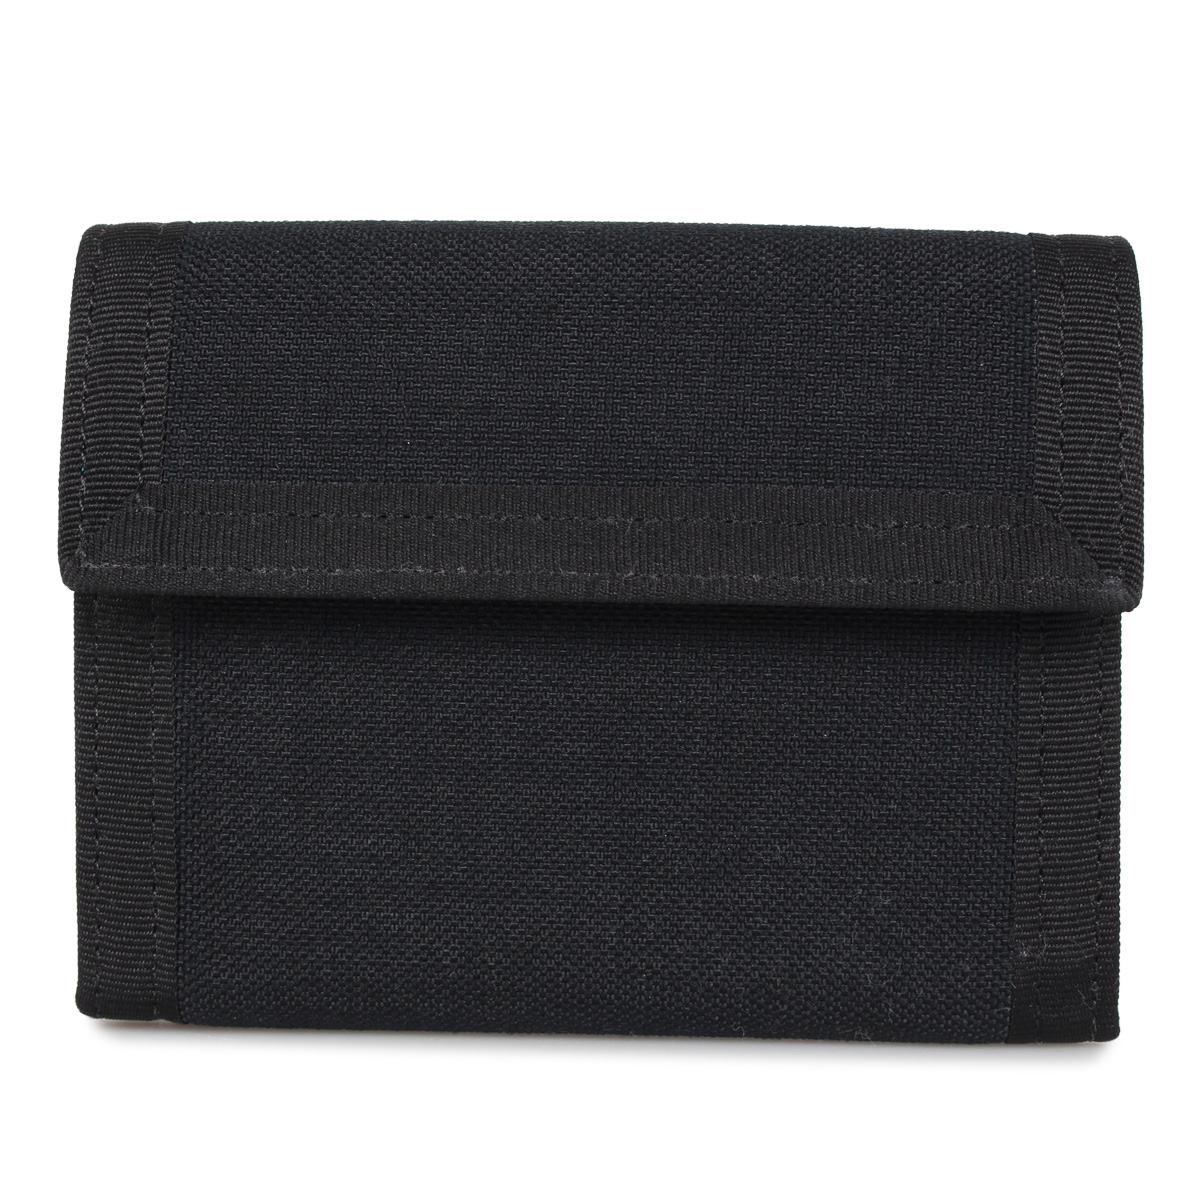 MAISON MARGIELA WALLET メゾンマルジェラ 財布 三つ折り メンズ レディース ブラック 黒 S55UI0208-T8013 [3/4 新入荷]